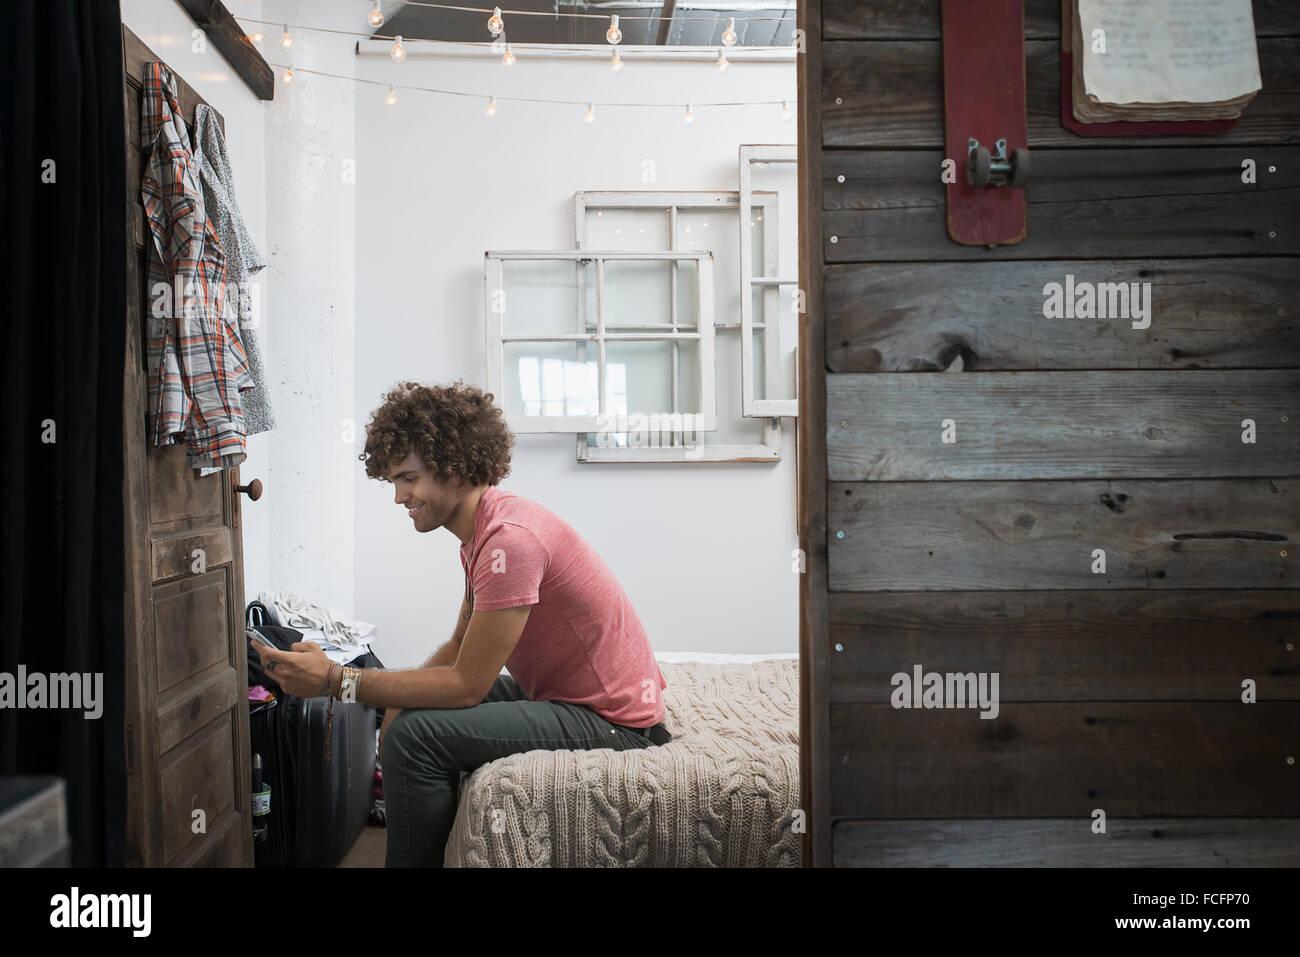 Loft vivir. Un hombre joven con un teléfono inteligente. Imagen De Stock